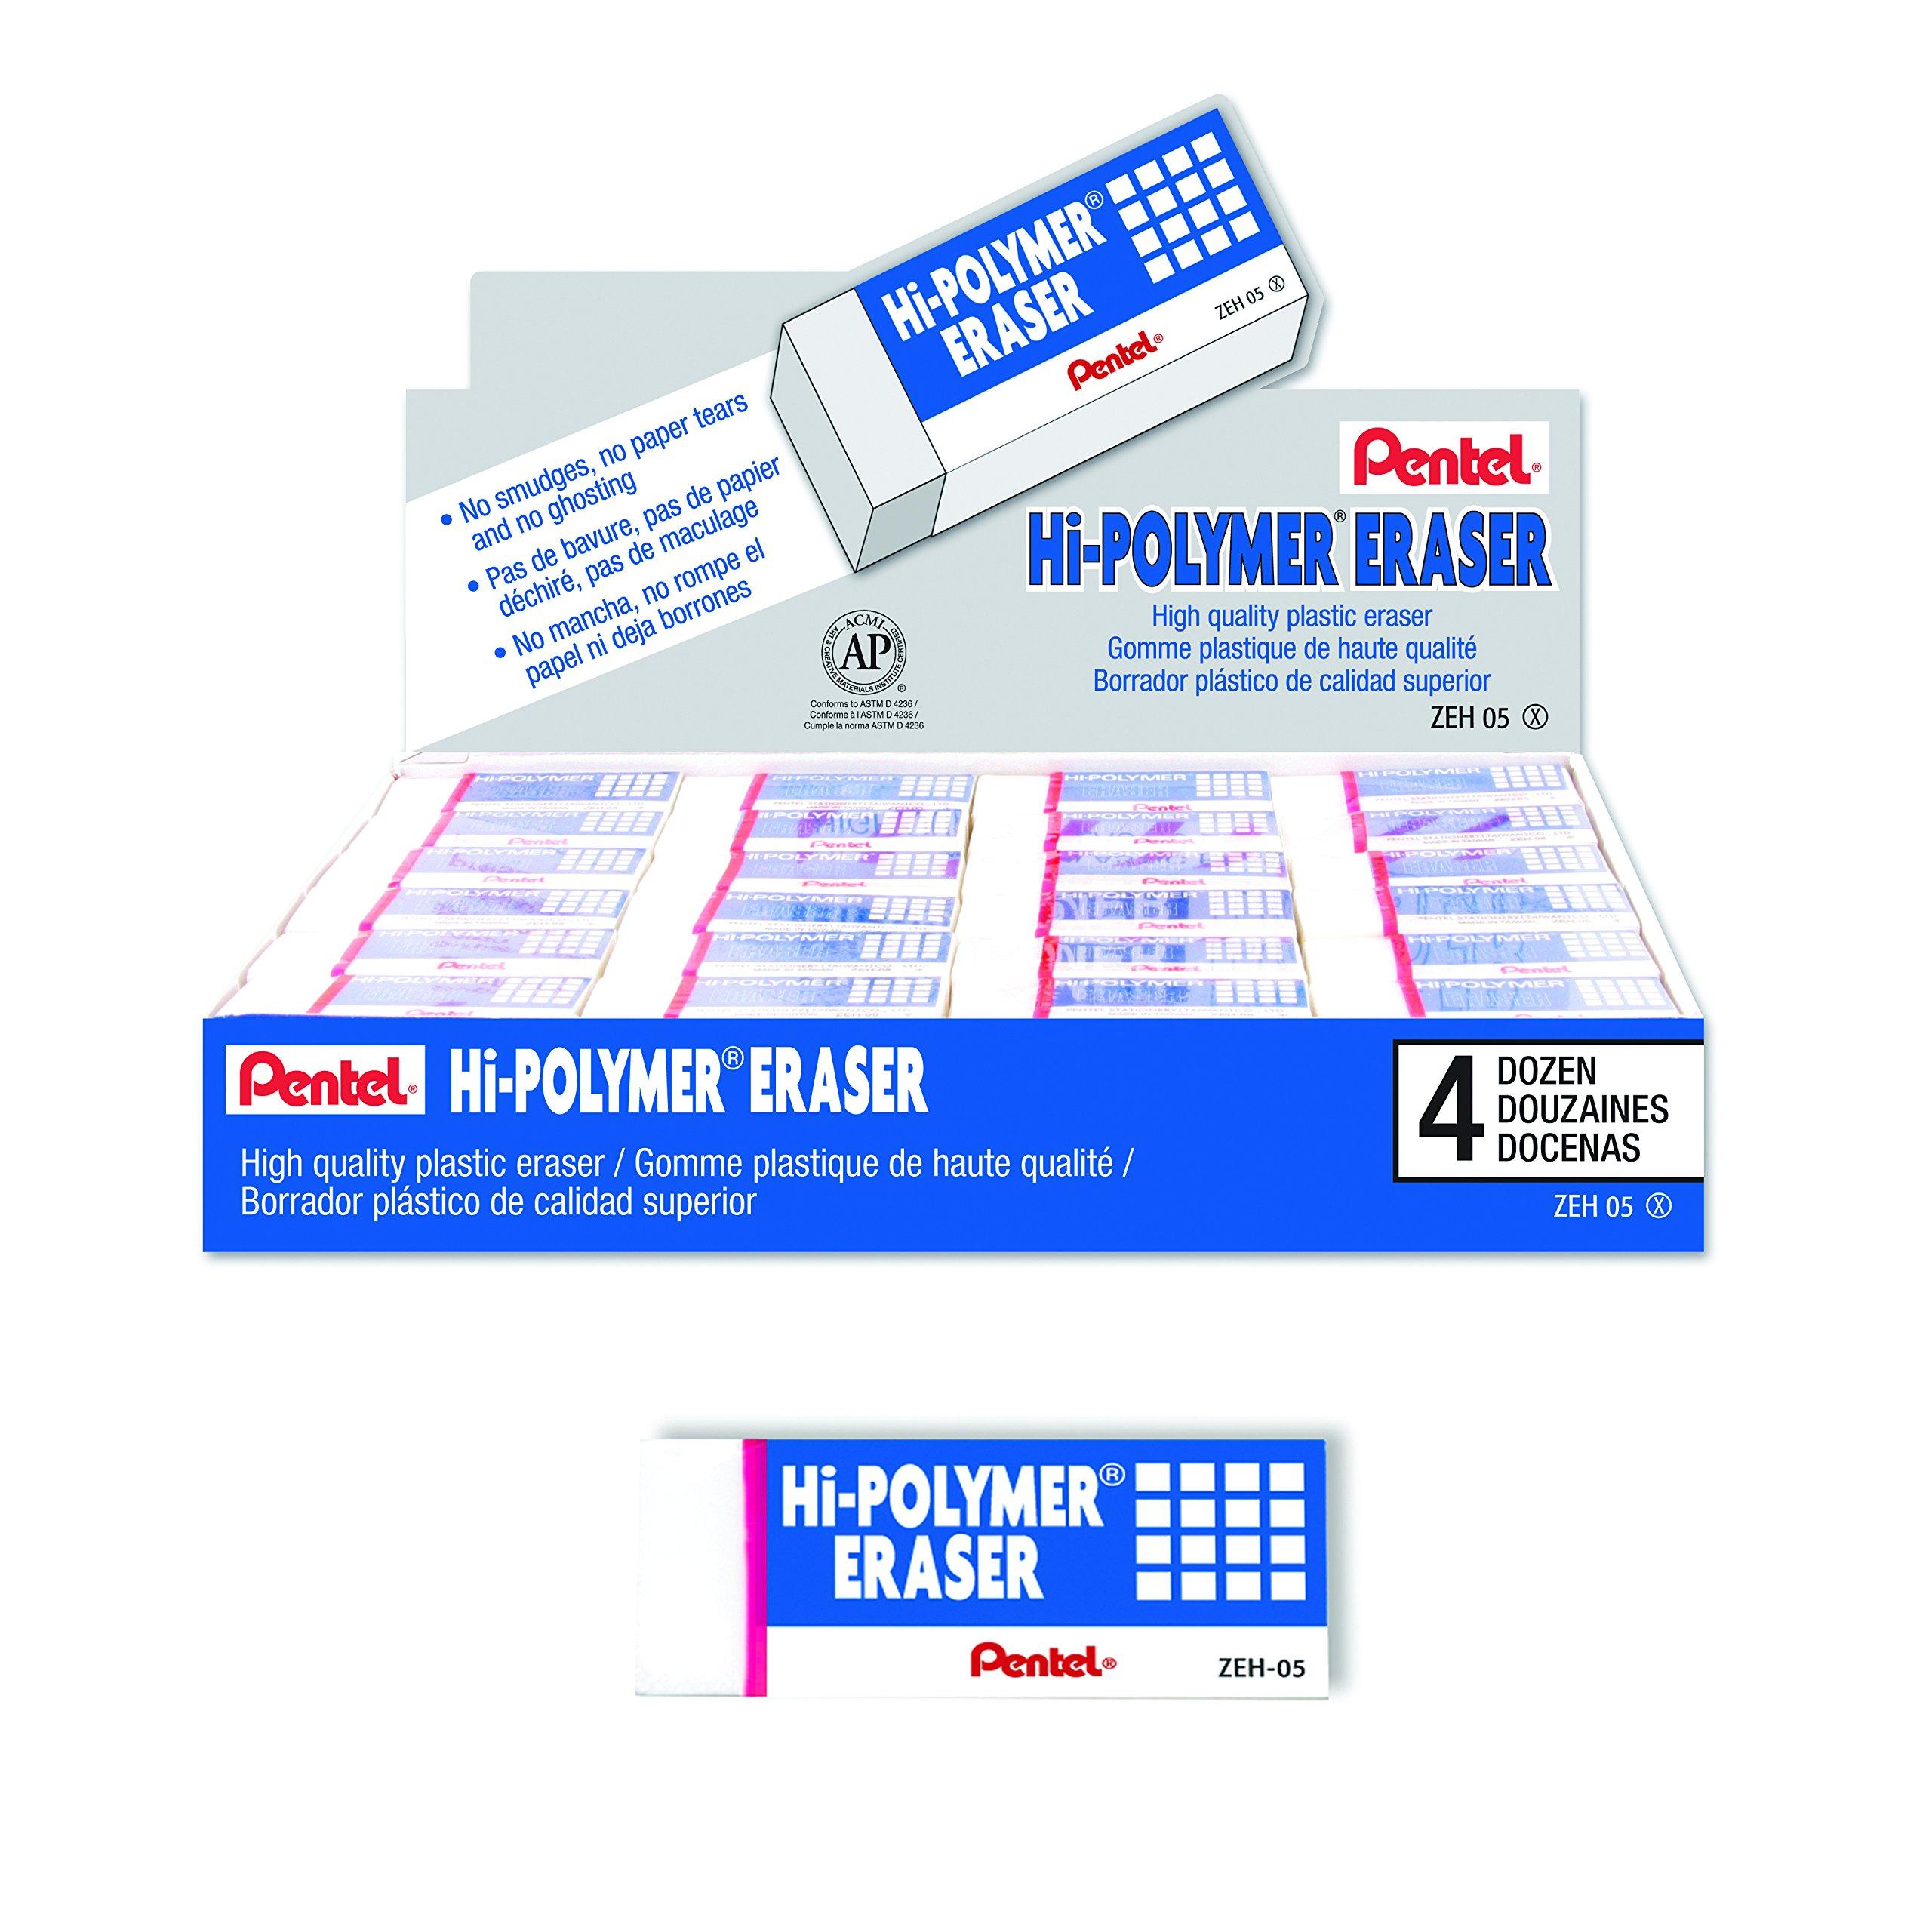 Pentel Hi-Polymer Block Eraser, Small, Box of 48 Erasers (ZEH-05) by Pentel (Image #1)